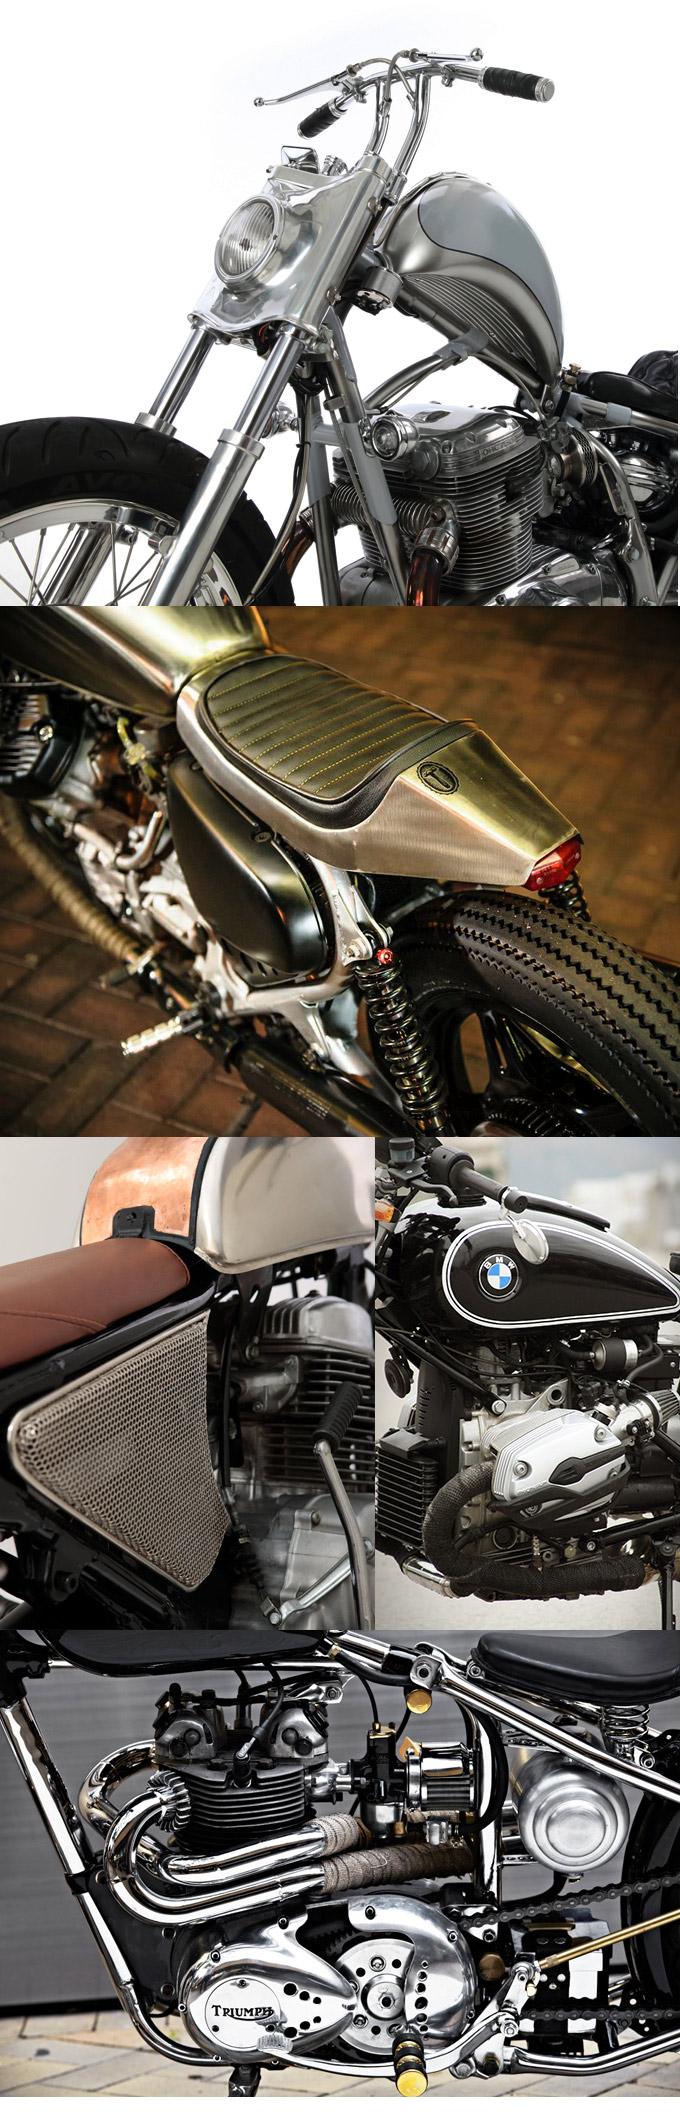 Moto-Mania World Roundup :: Vol. 5